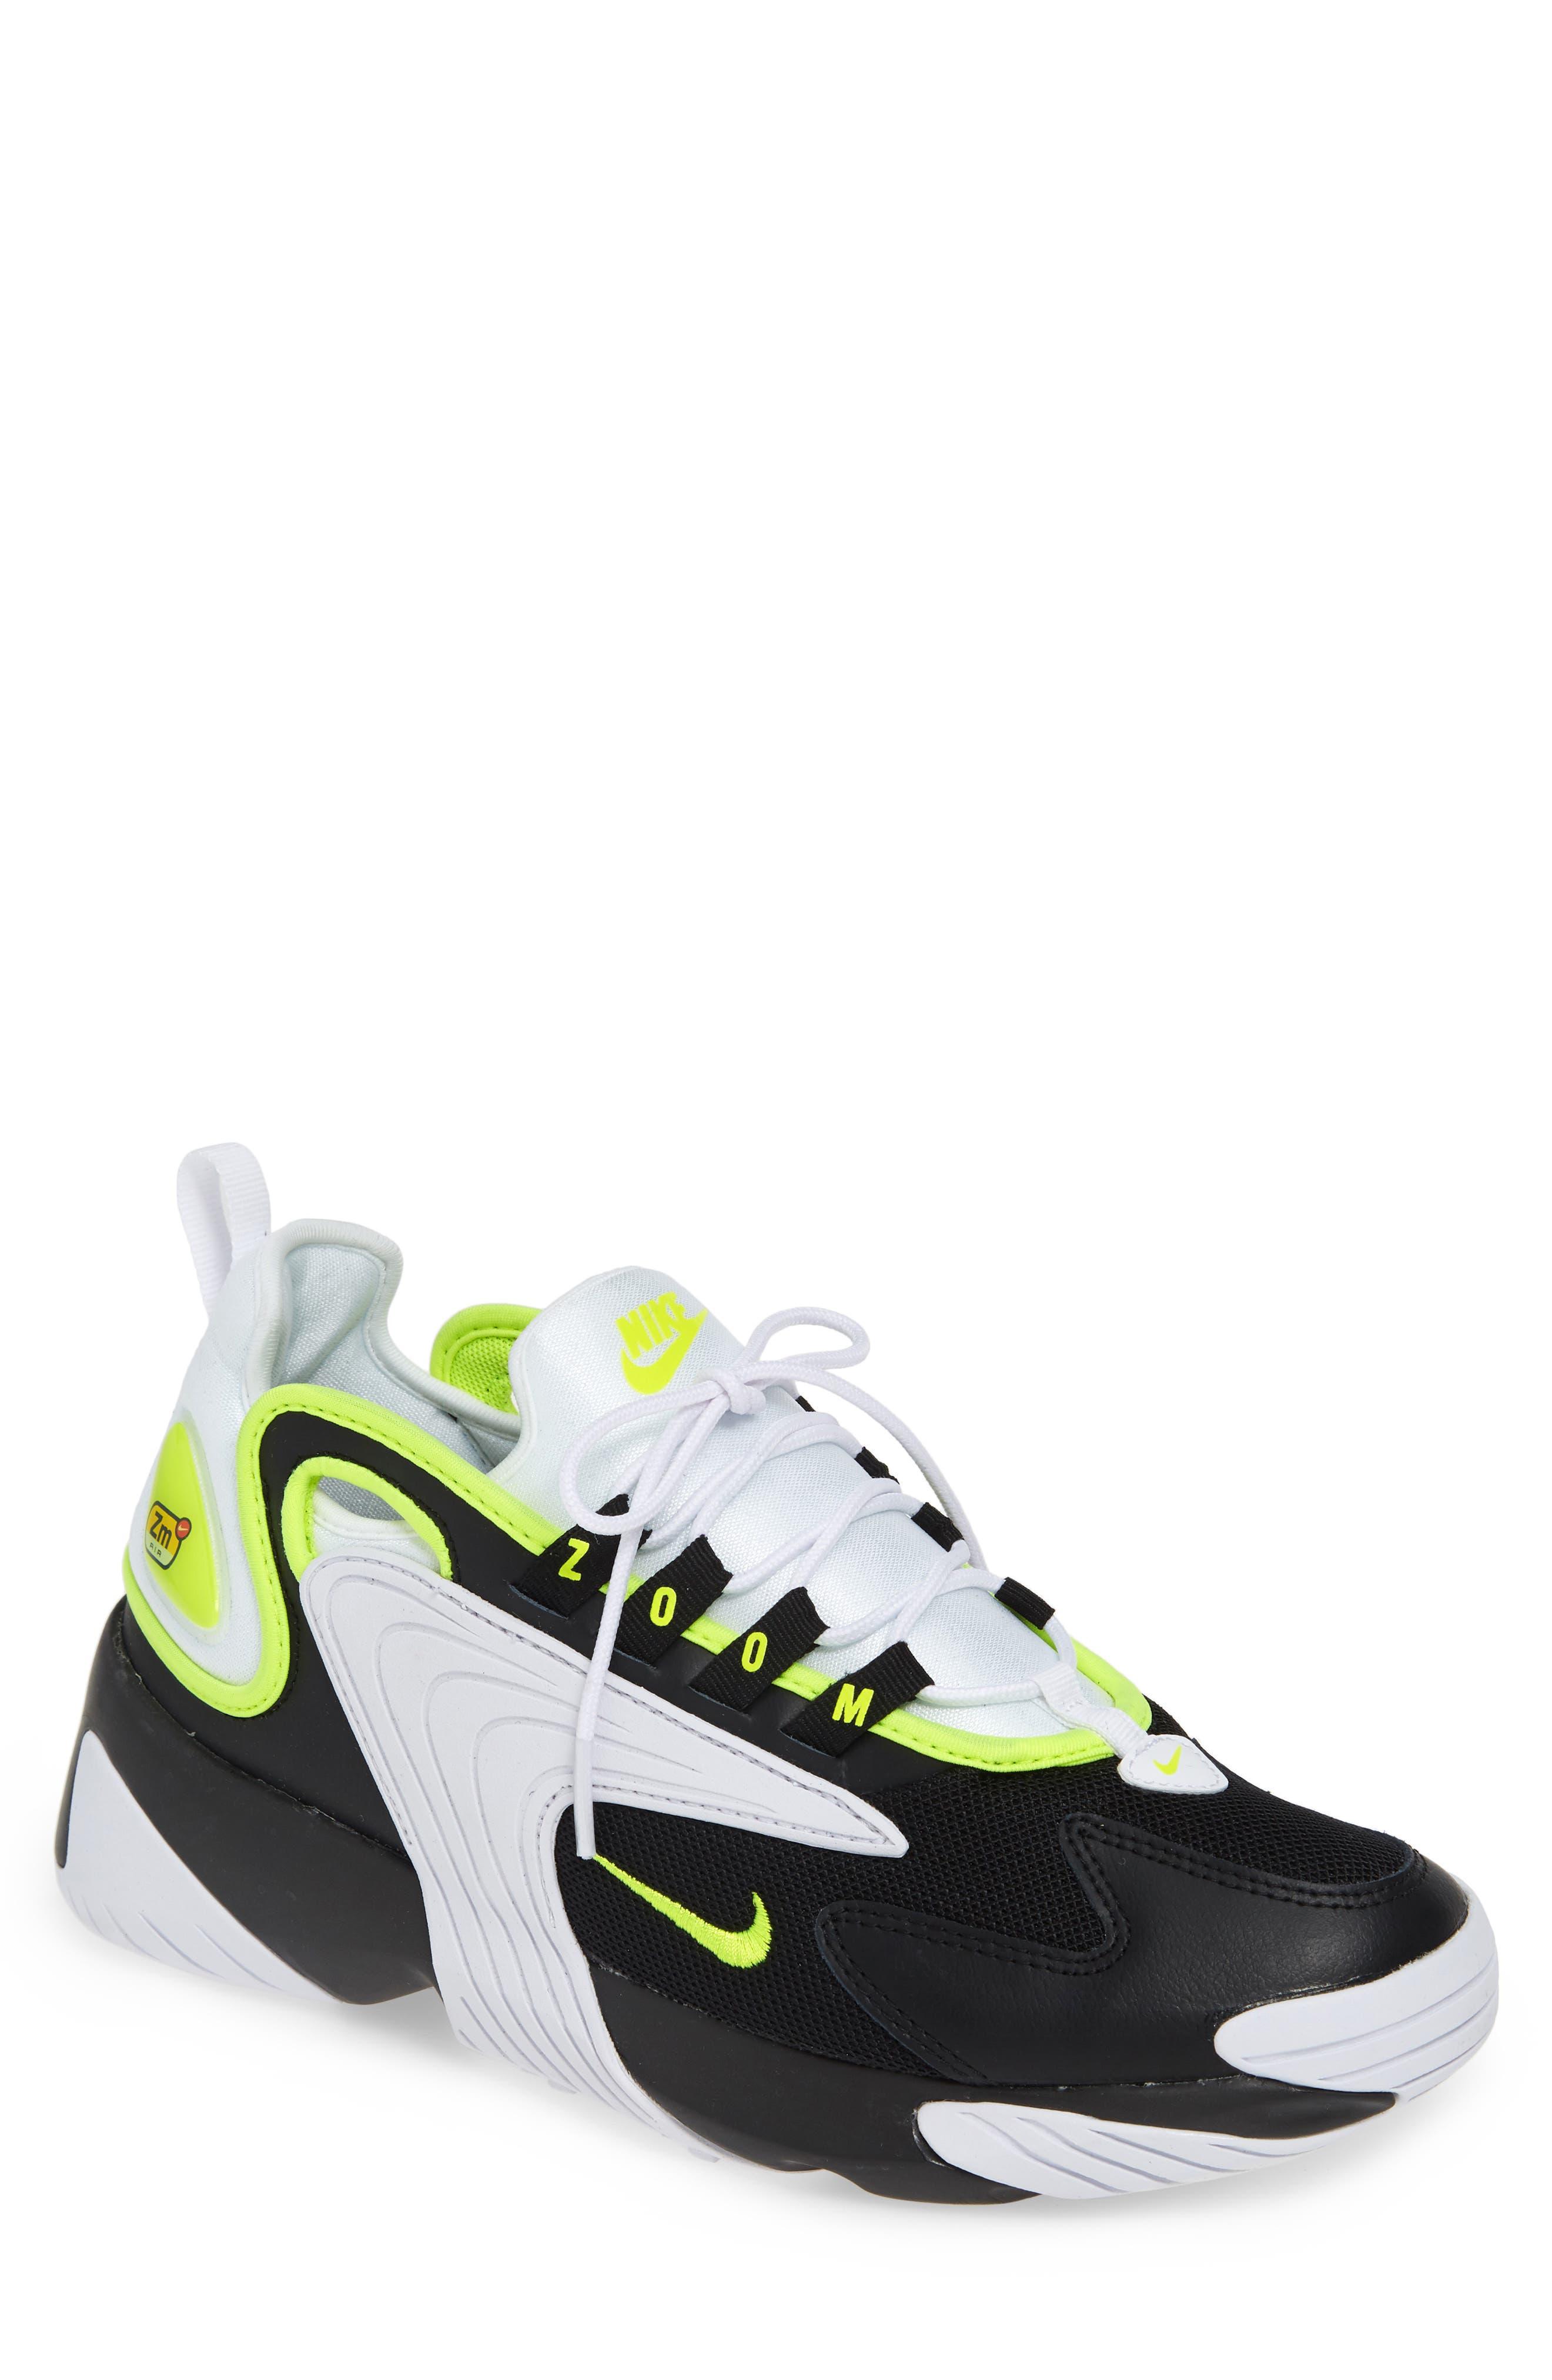 NIKE, Zoom 2K Sneaker, Main thumbnail 1, color, BLACK/ VOLT/ WHITE